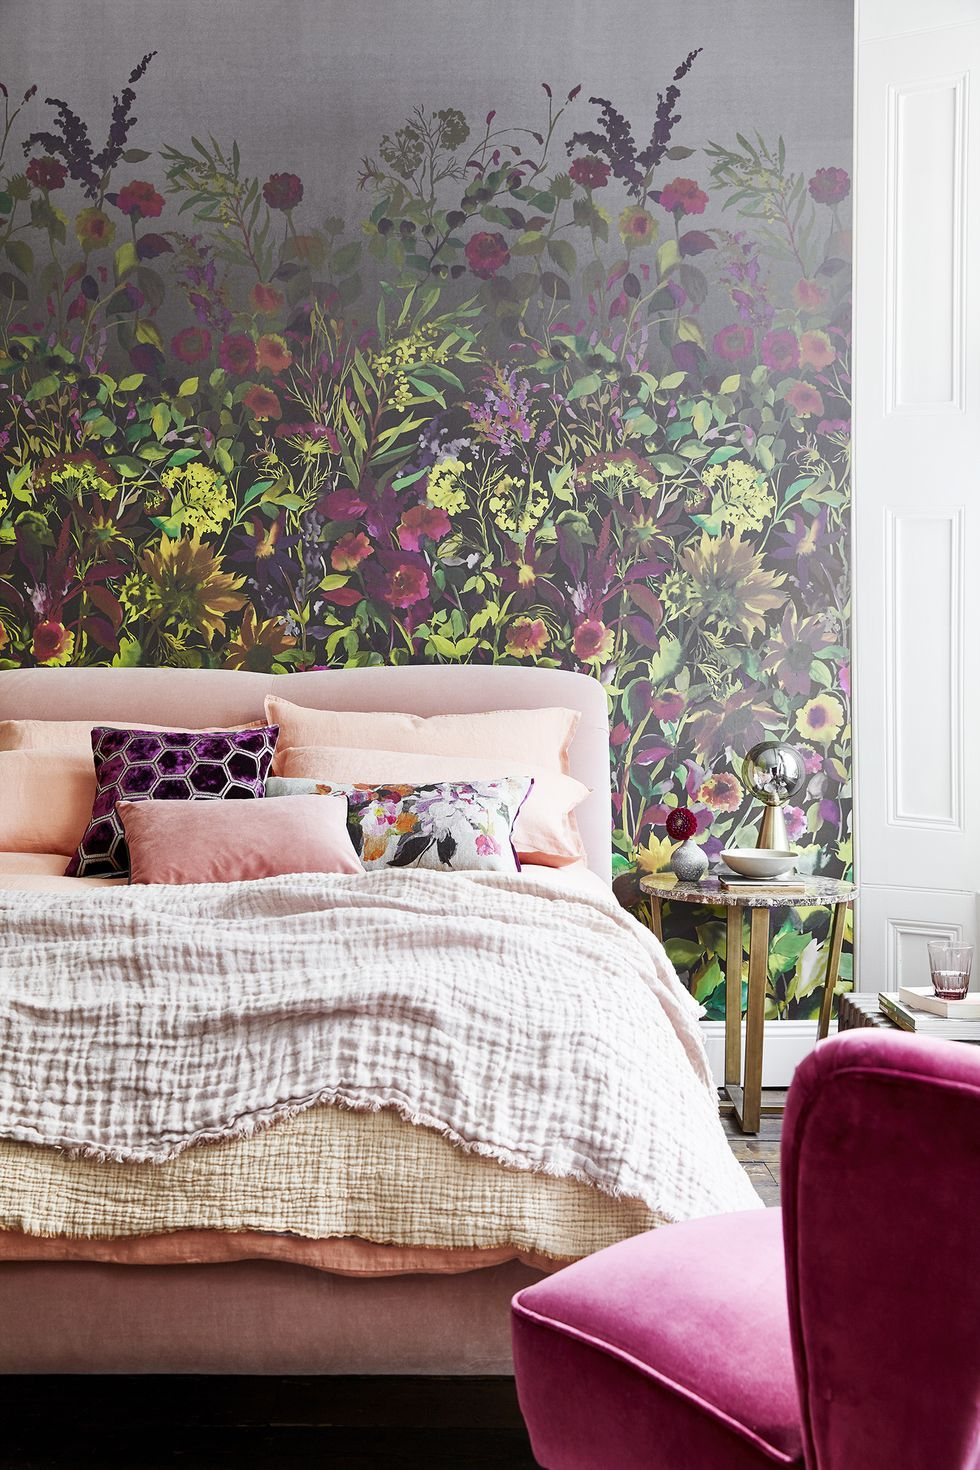 Kontrastvegg til soverom med blomster